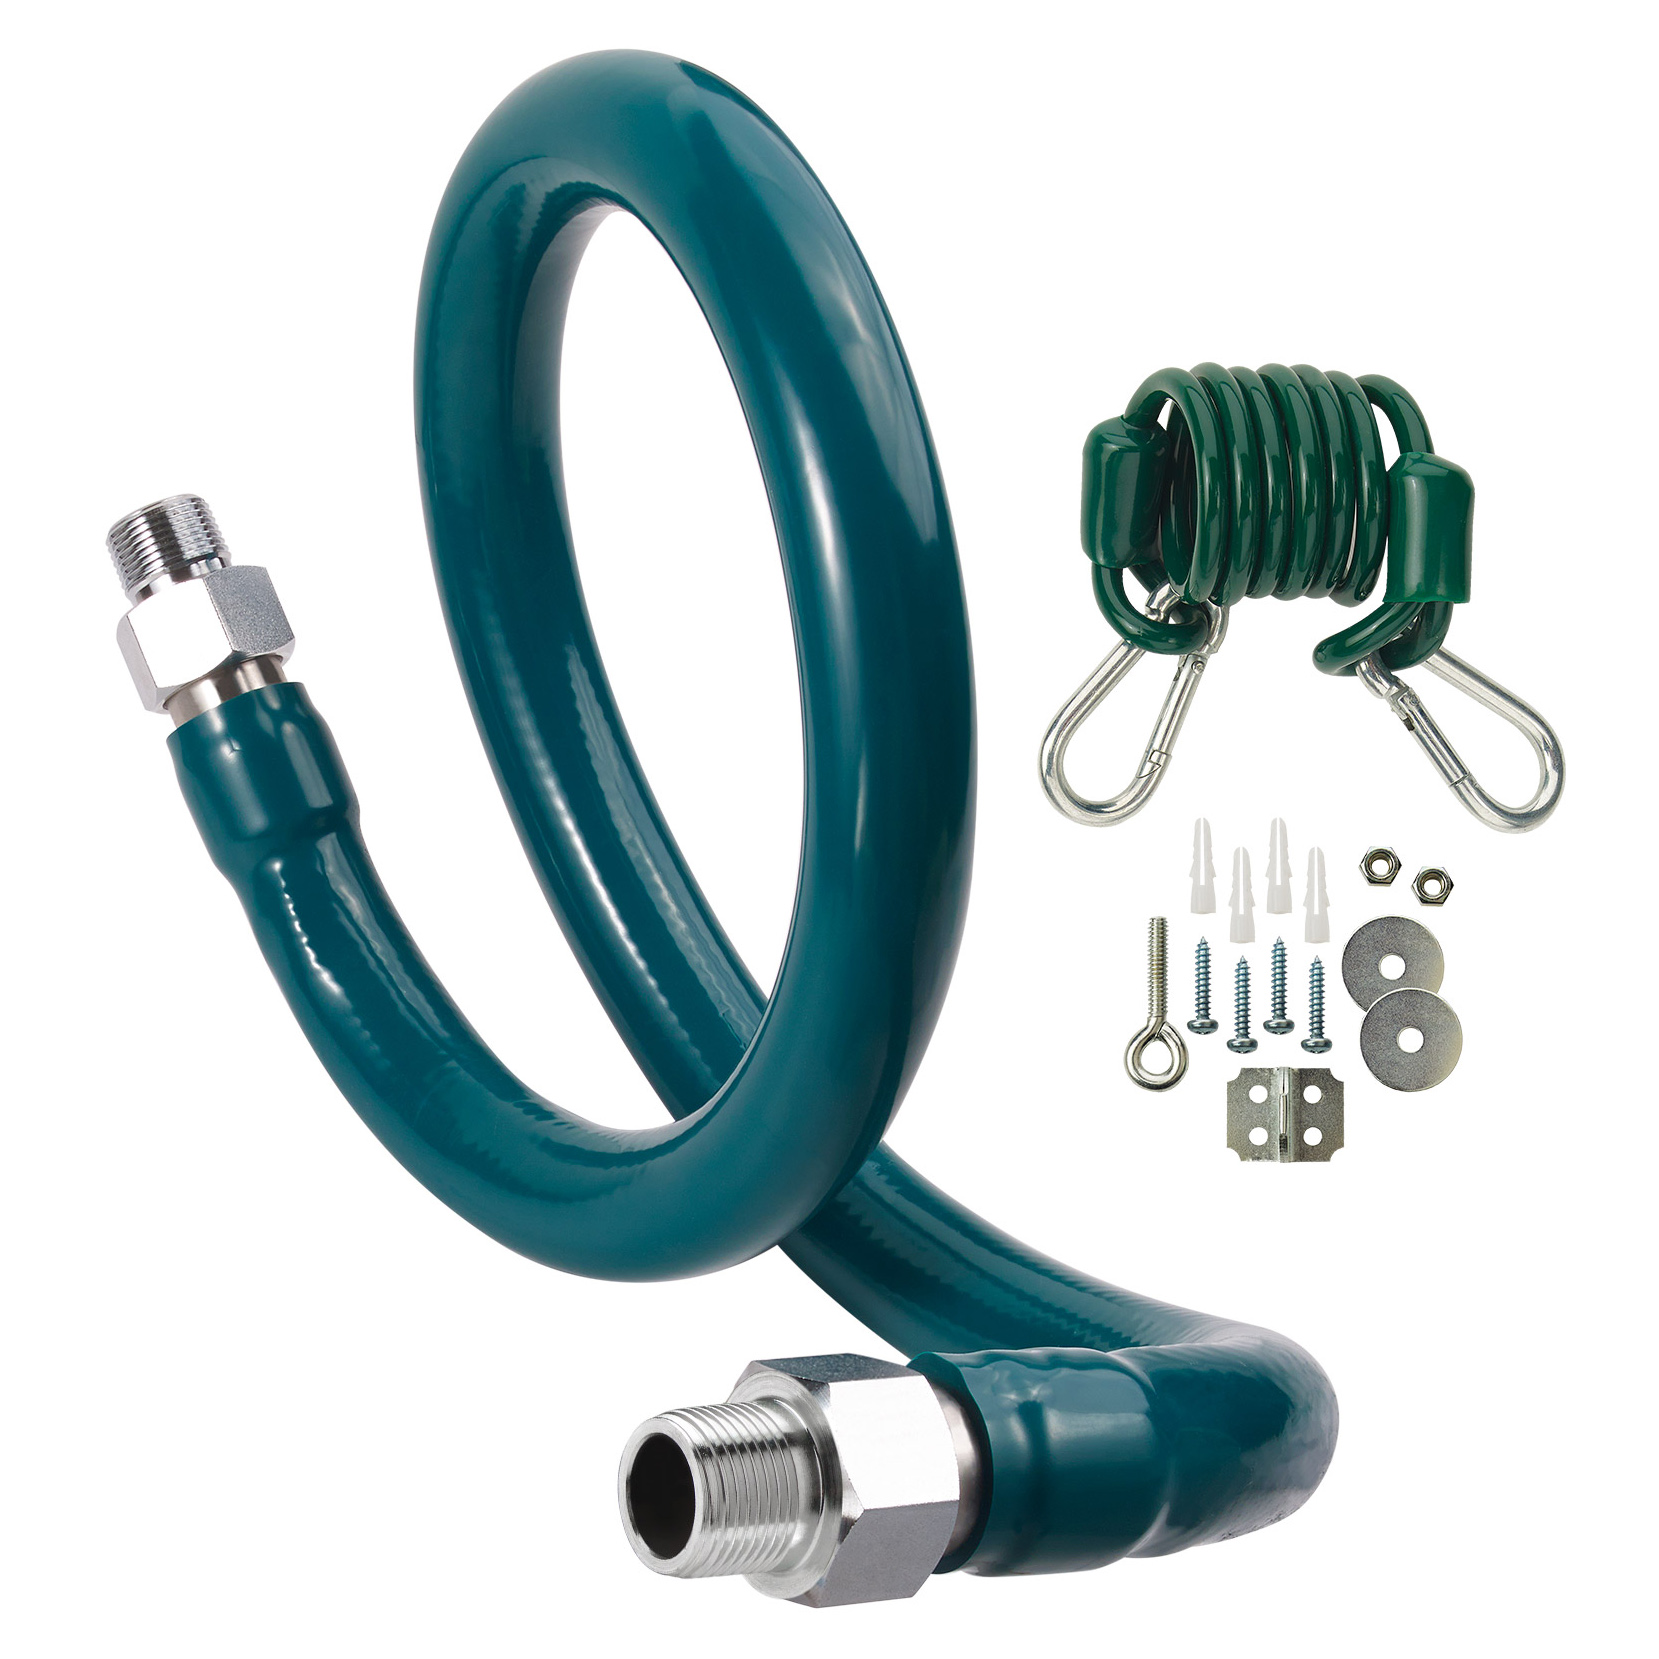 Krowne Metal M5048K6 gas connector hose kit